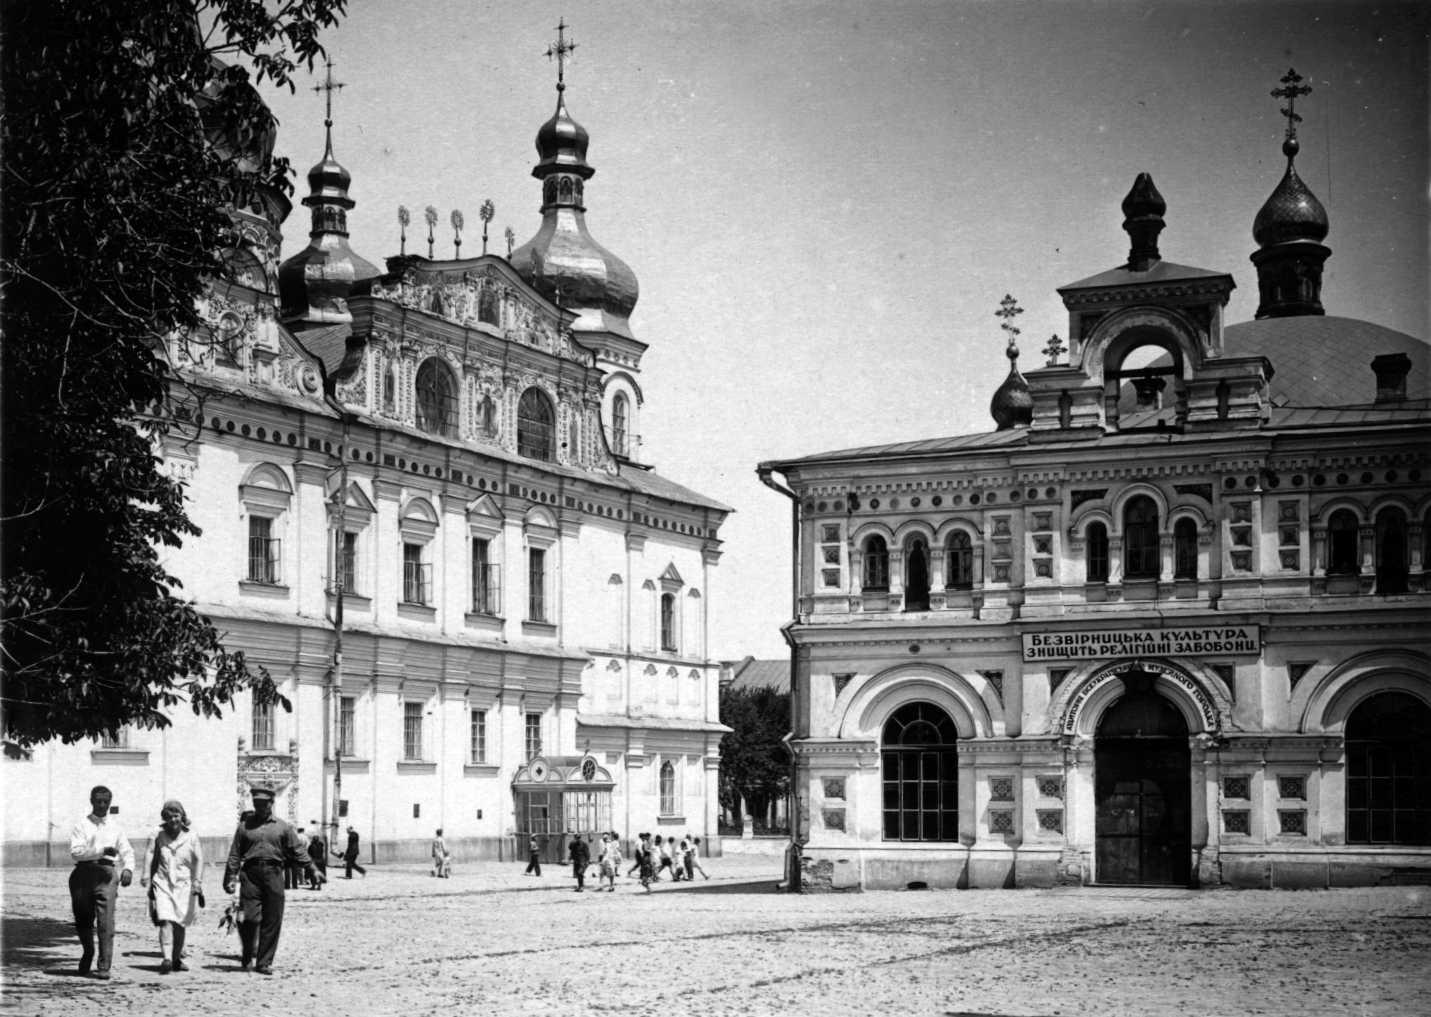 Трапезна церква Києво-Печерської лаври